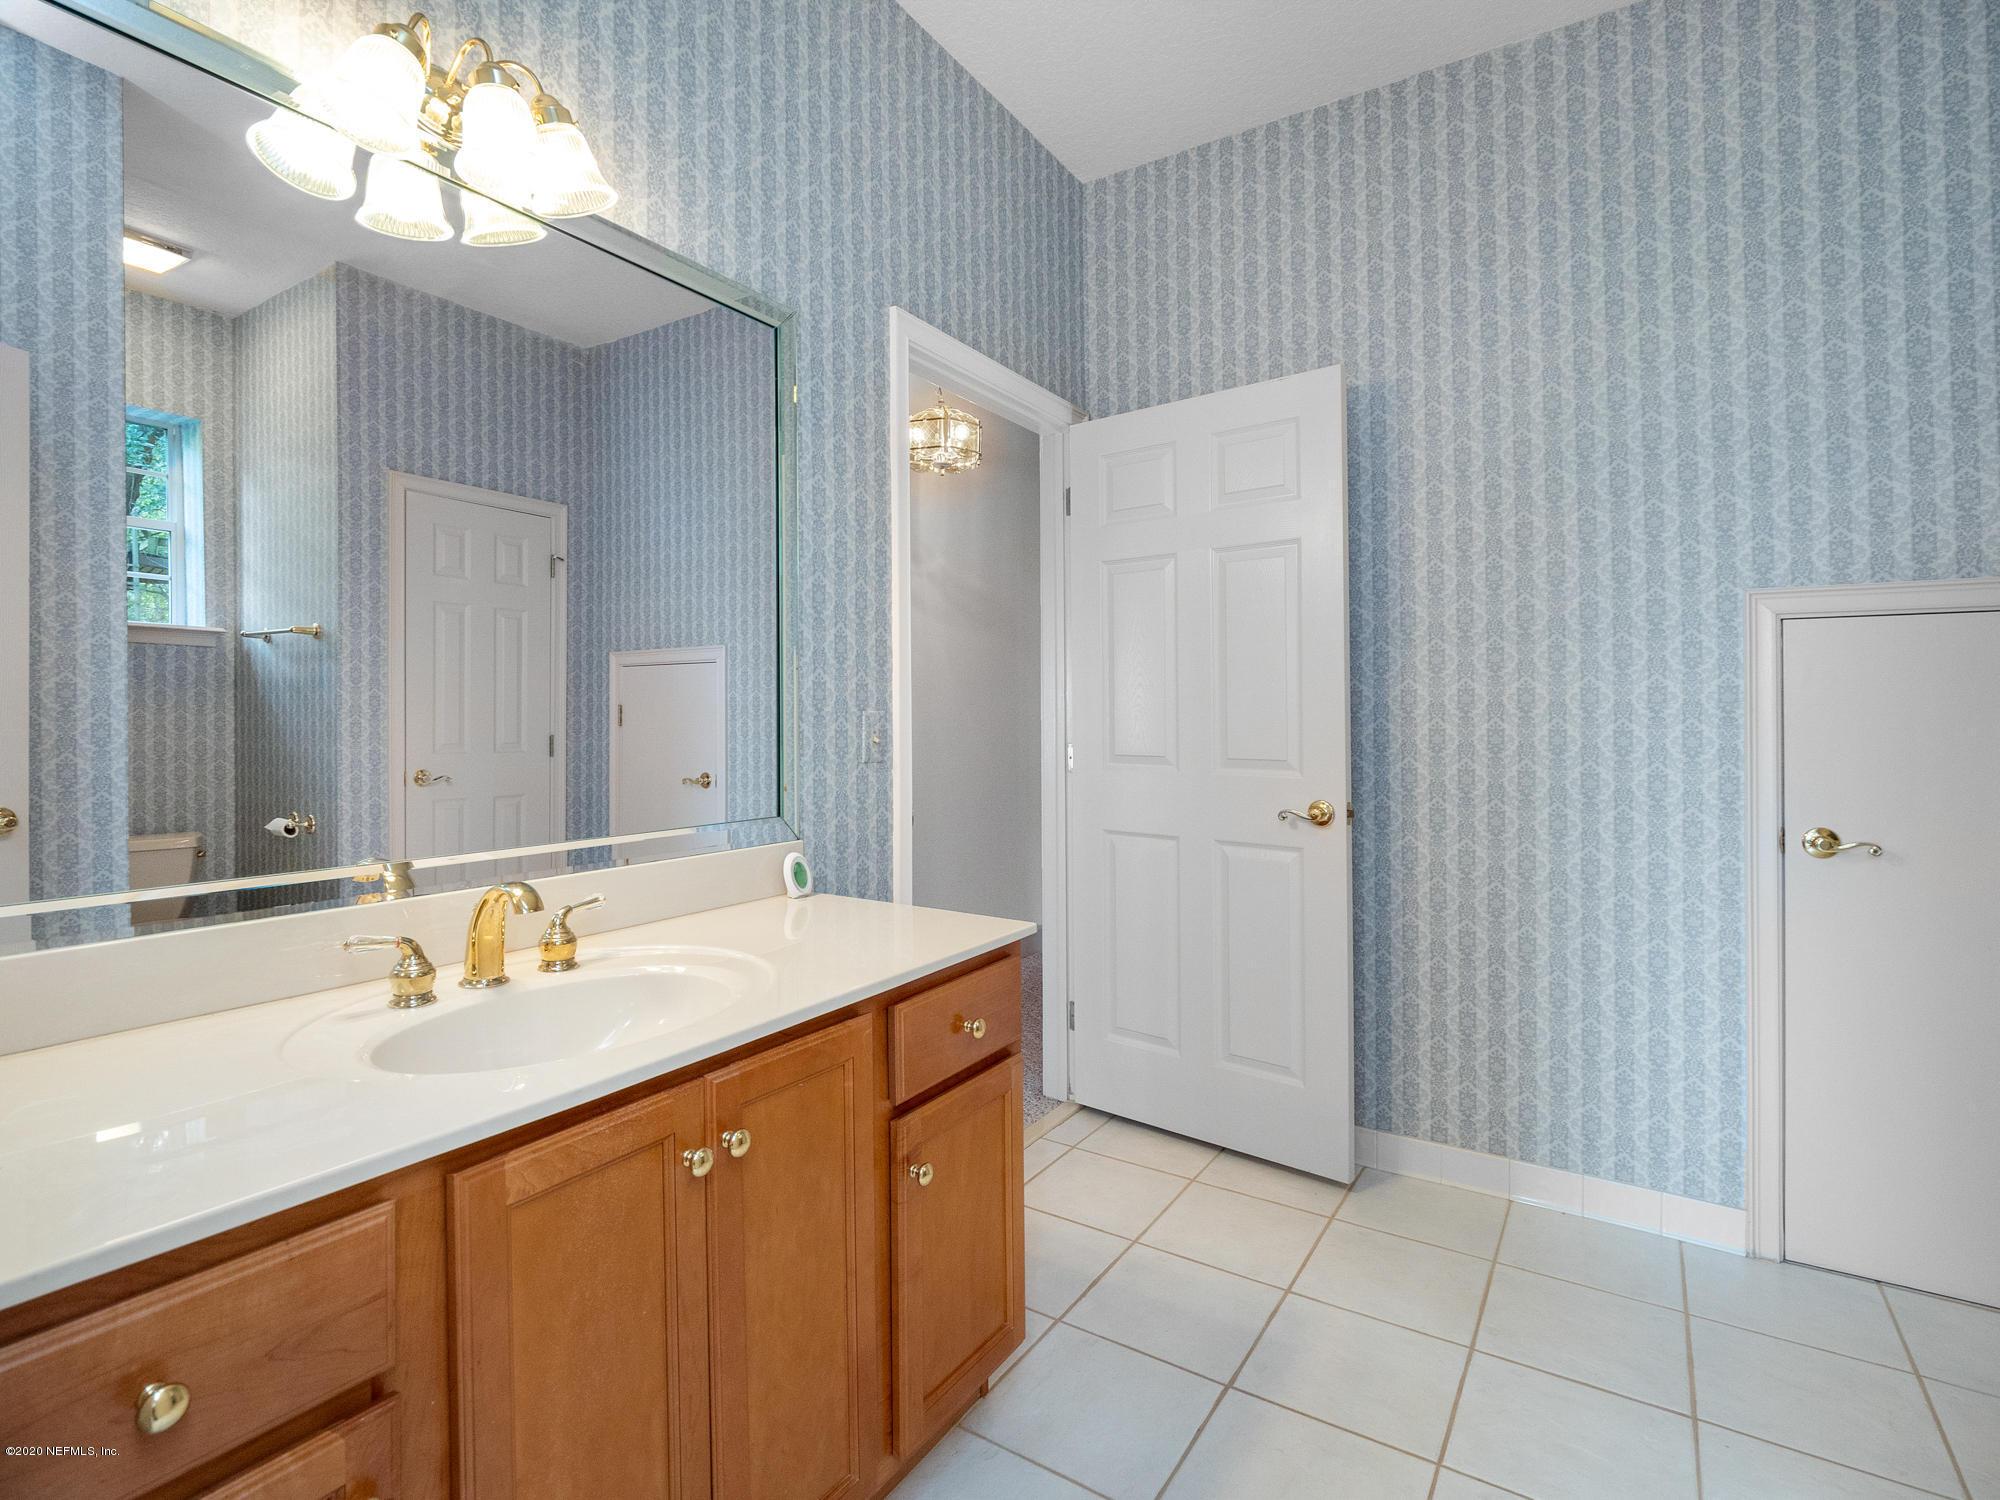 3664 SPINNAKER, JACKSONVILLE, FLORIDA 32277, 5 Bedrooms Bedrooms, ,3 BathroomsBathrooms,Residential,For sale,SPINNAKER,1083241